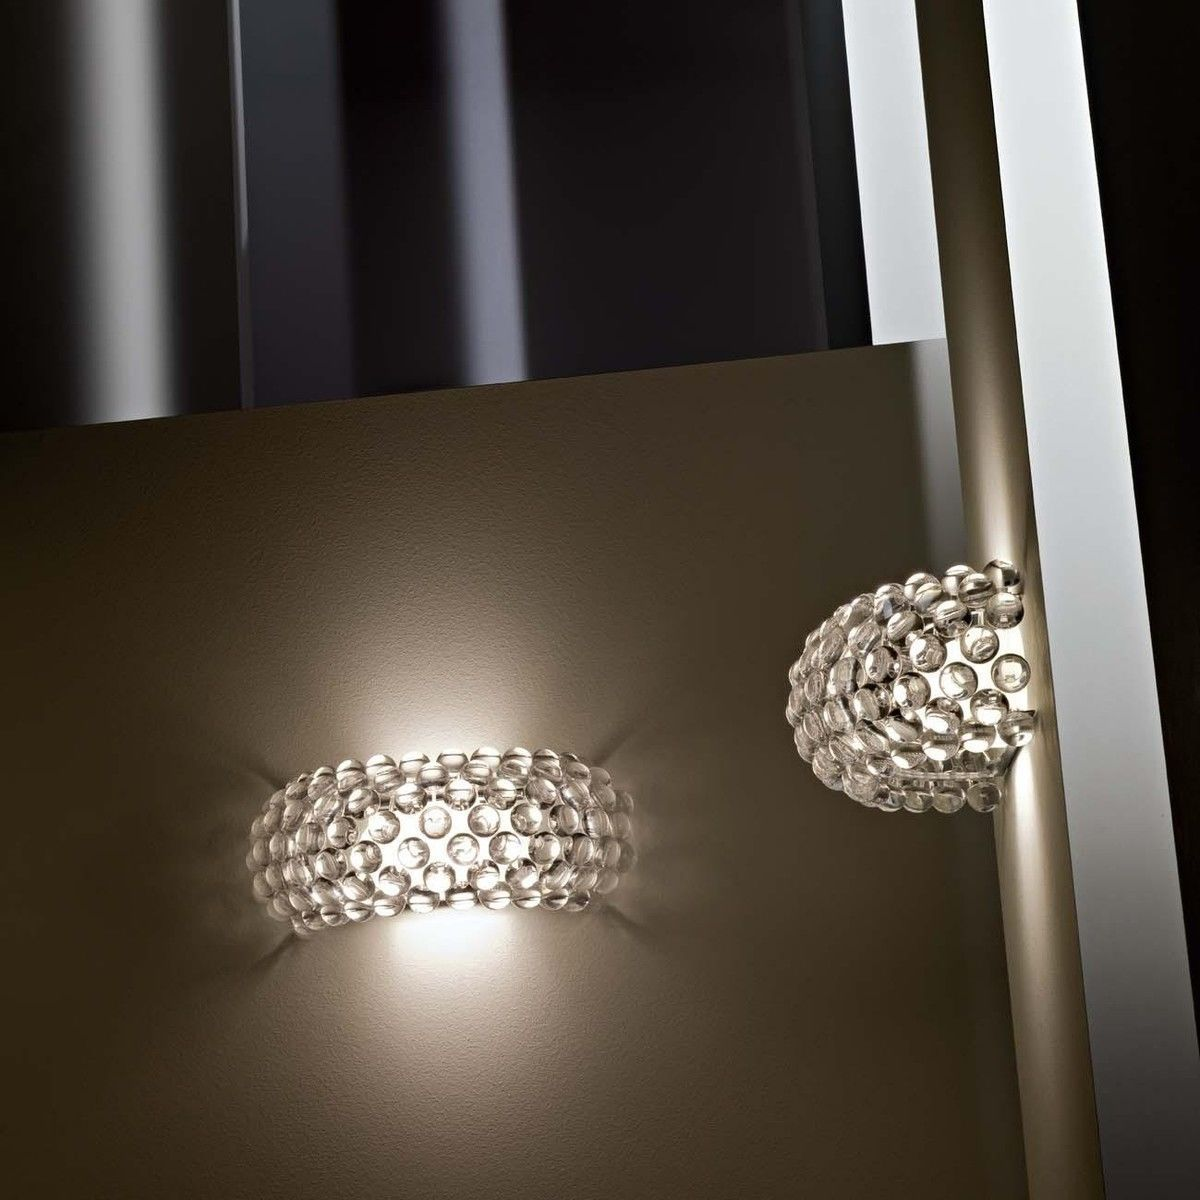 caboche parete wandleuchte foscarini. Black Bedroom Furniture Sets. Home Design Ideas